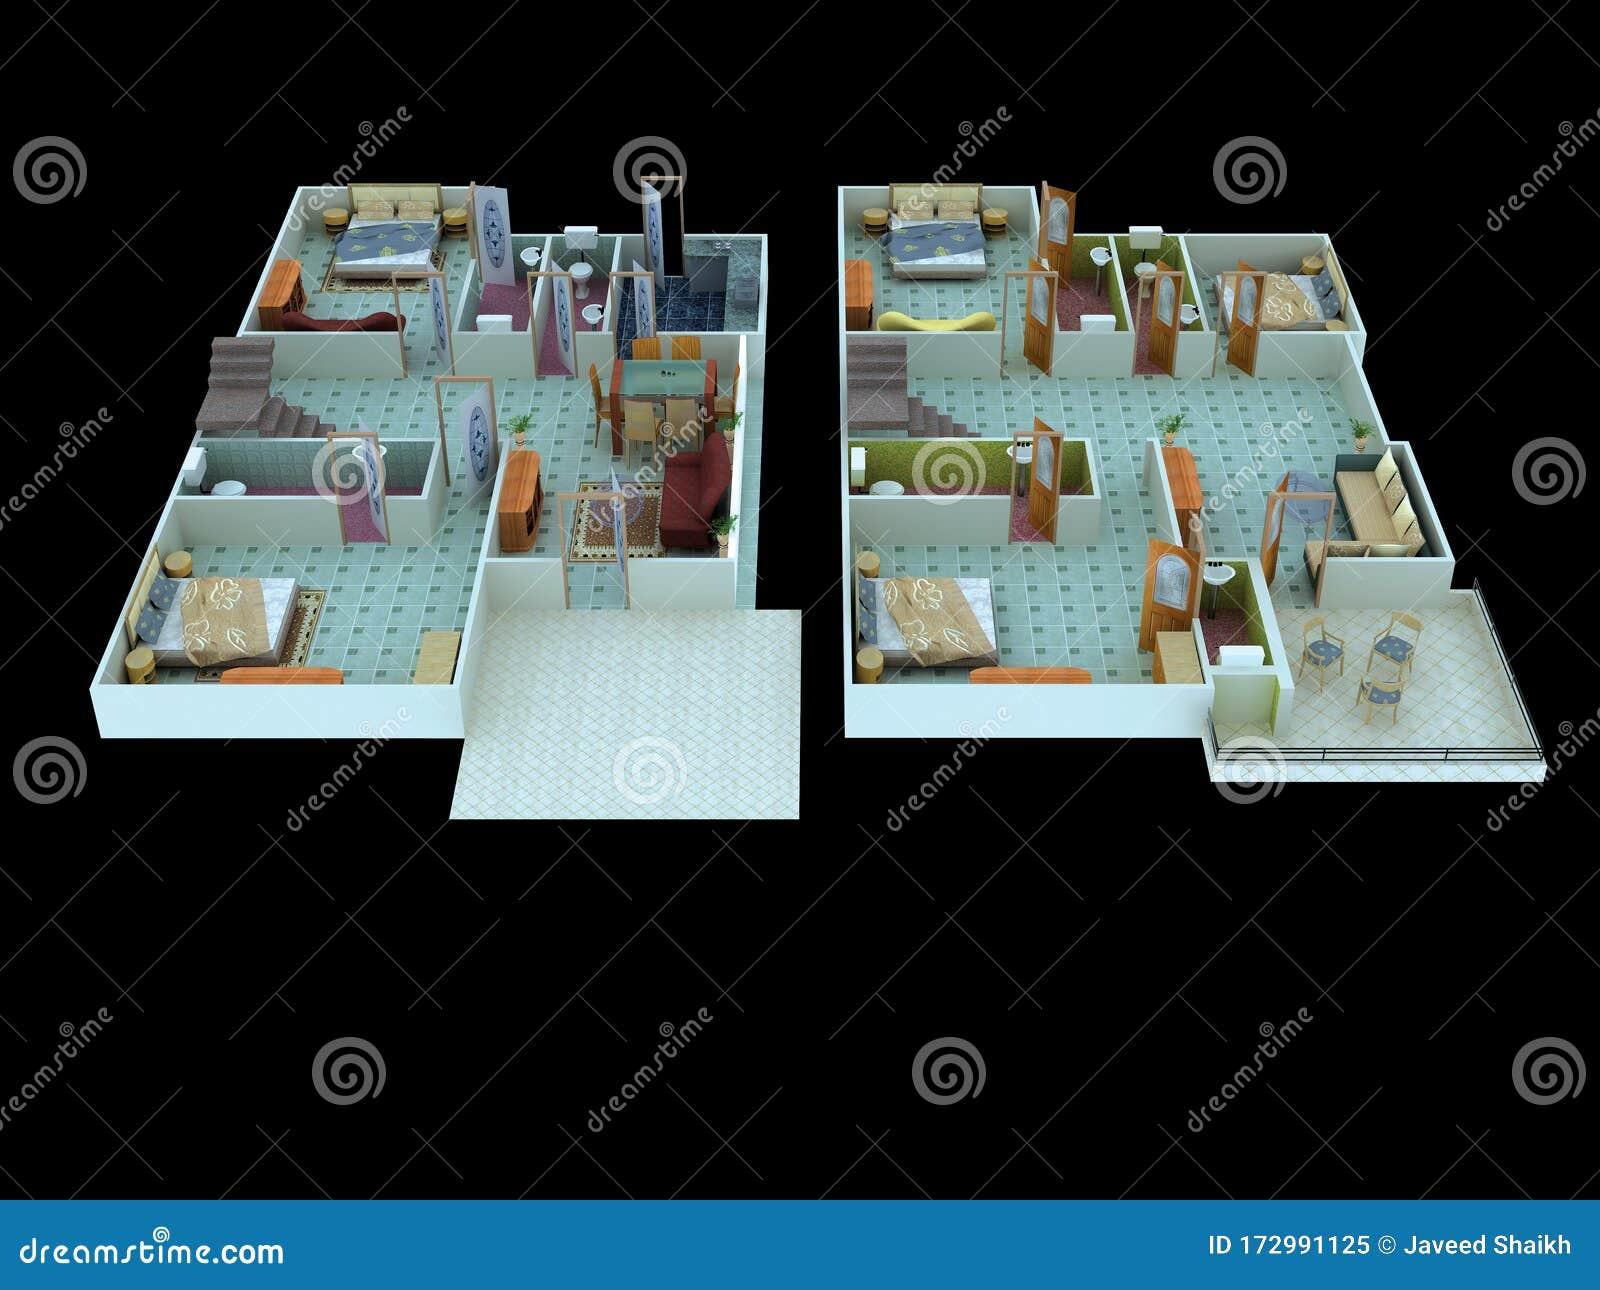 Interior Design Ideas Home Decorating Stock Illustration Illustration Of Pinterest Apartment 172991125